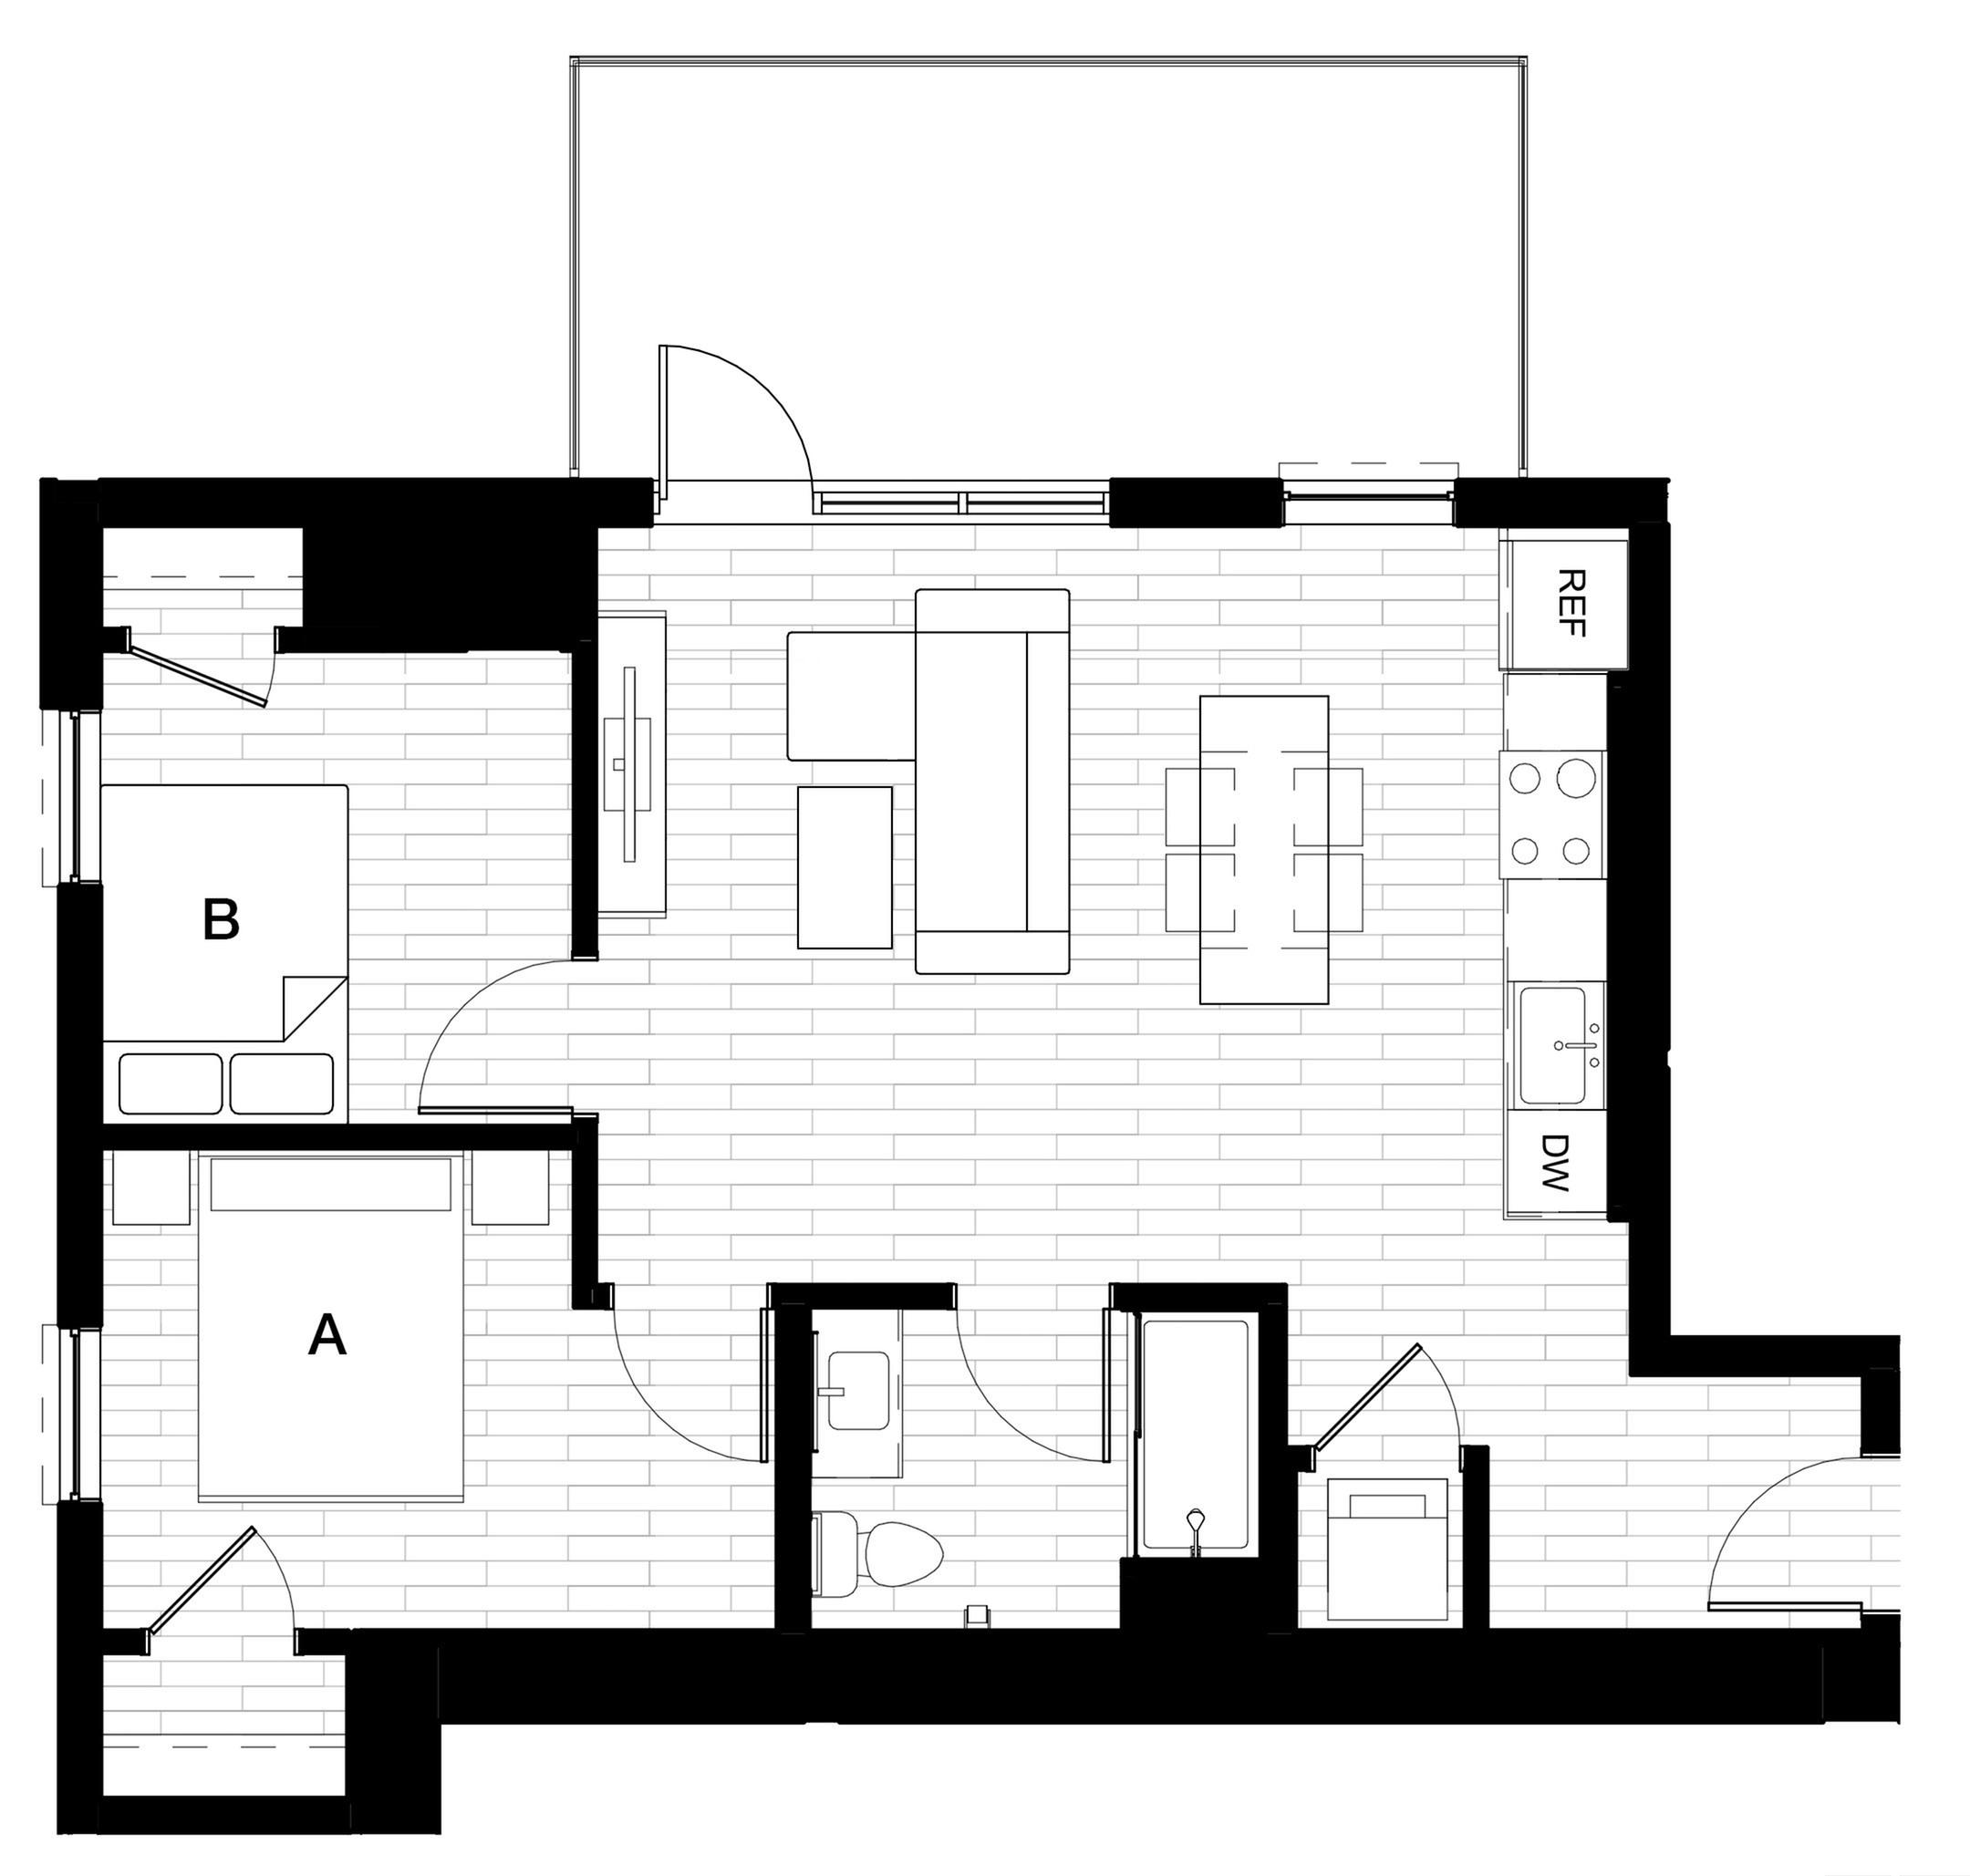 2x1 C - Balcony